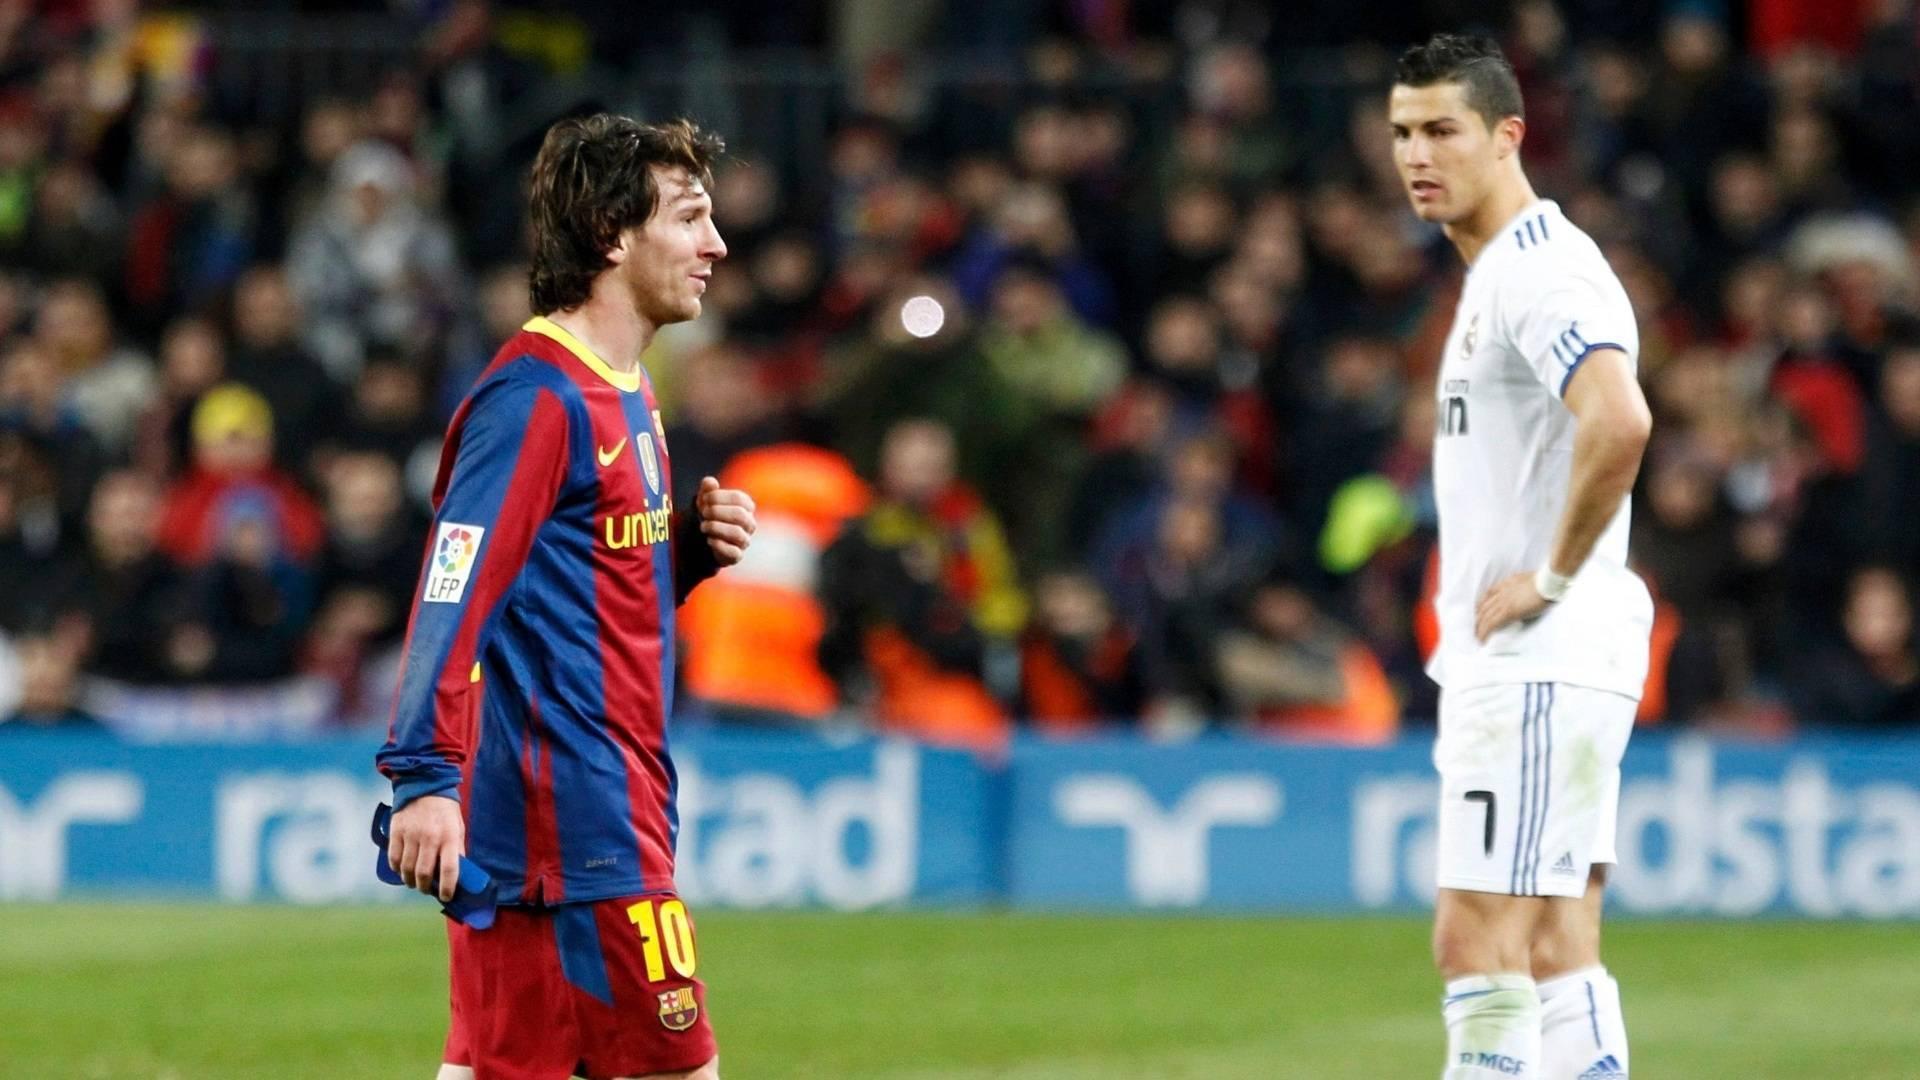 Messi Vs Ronaldo Footballers Wallpaper Hd - Vs Real Madrid 5 0 , HD Wallpaper & Backgrounds